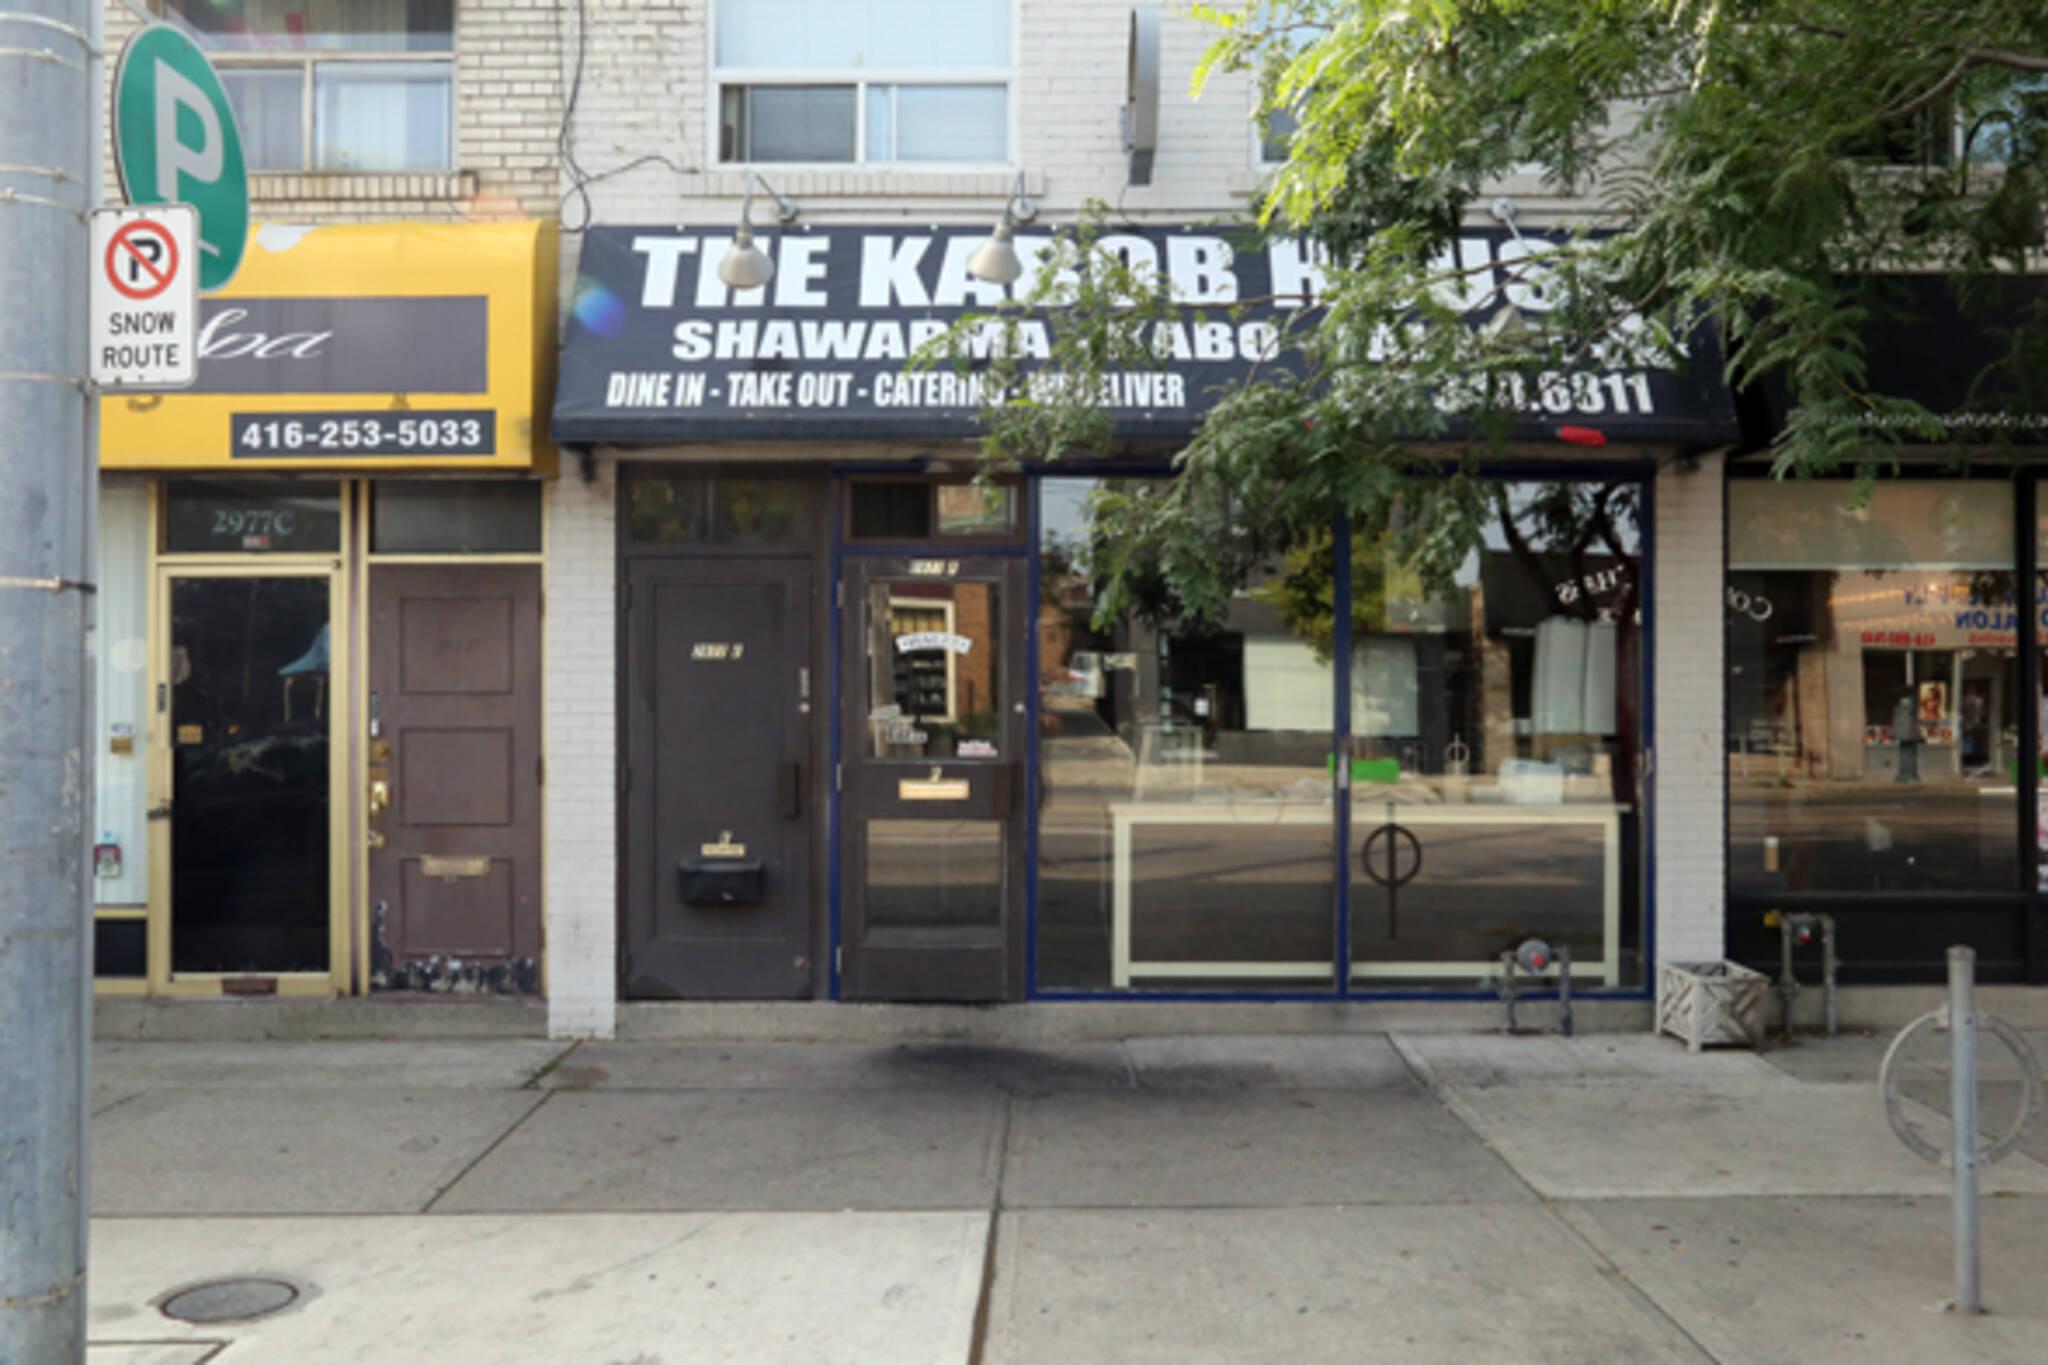 The Kabob House